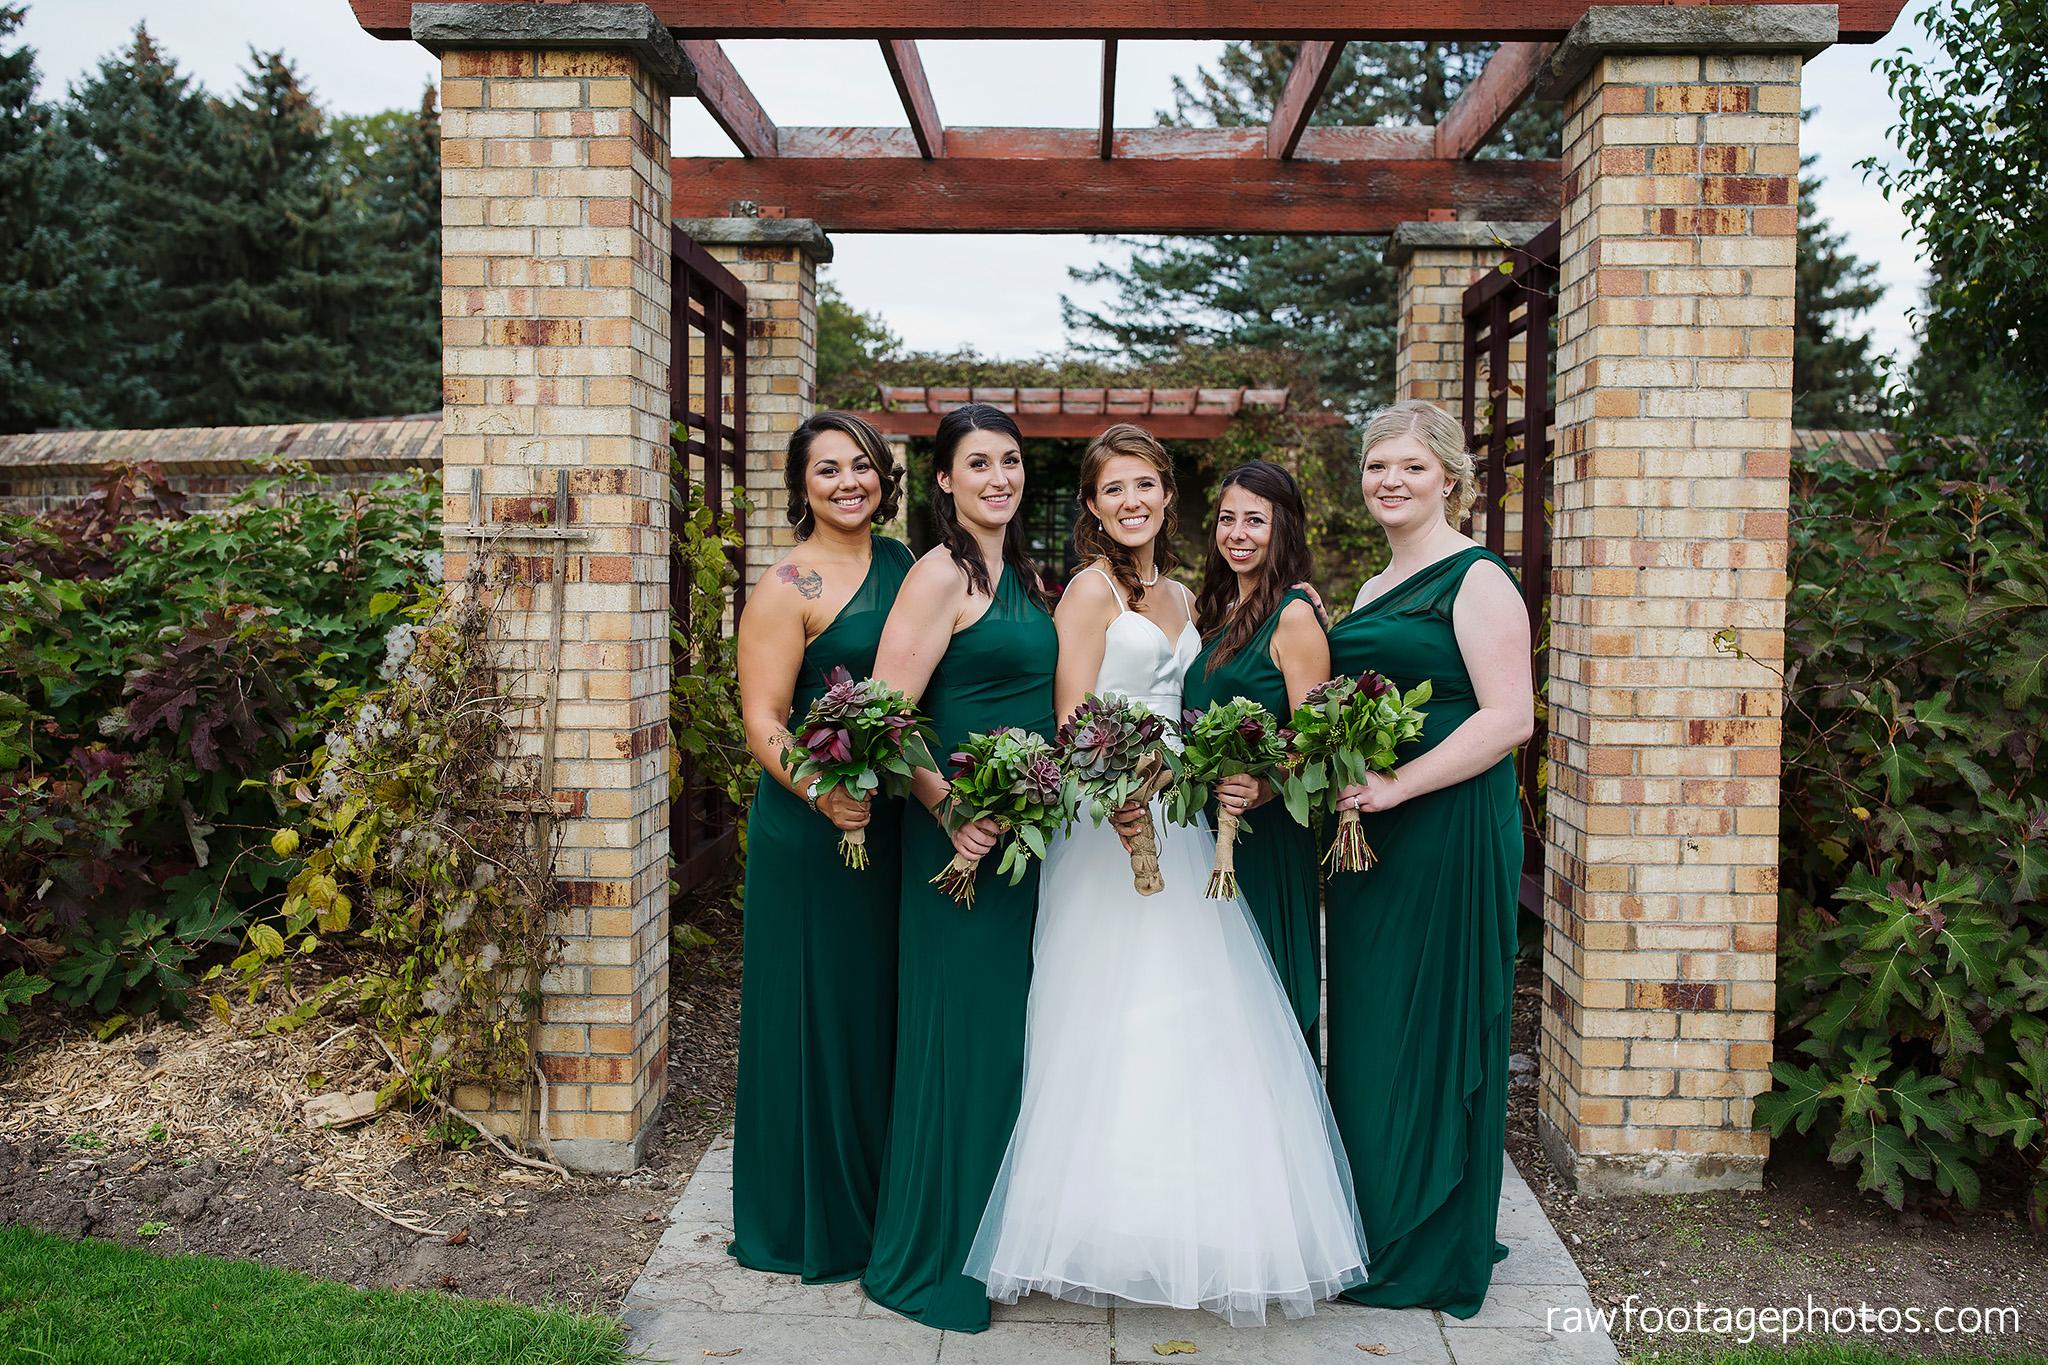 london_ontario_wedding_photographer-civic_gardens-springbank_park-succulent_bouquet-fall_wedding-bridge-raw_footage_photography051.jpg